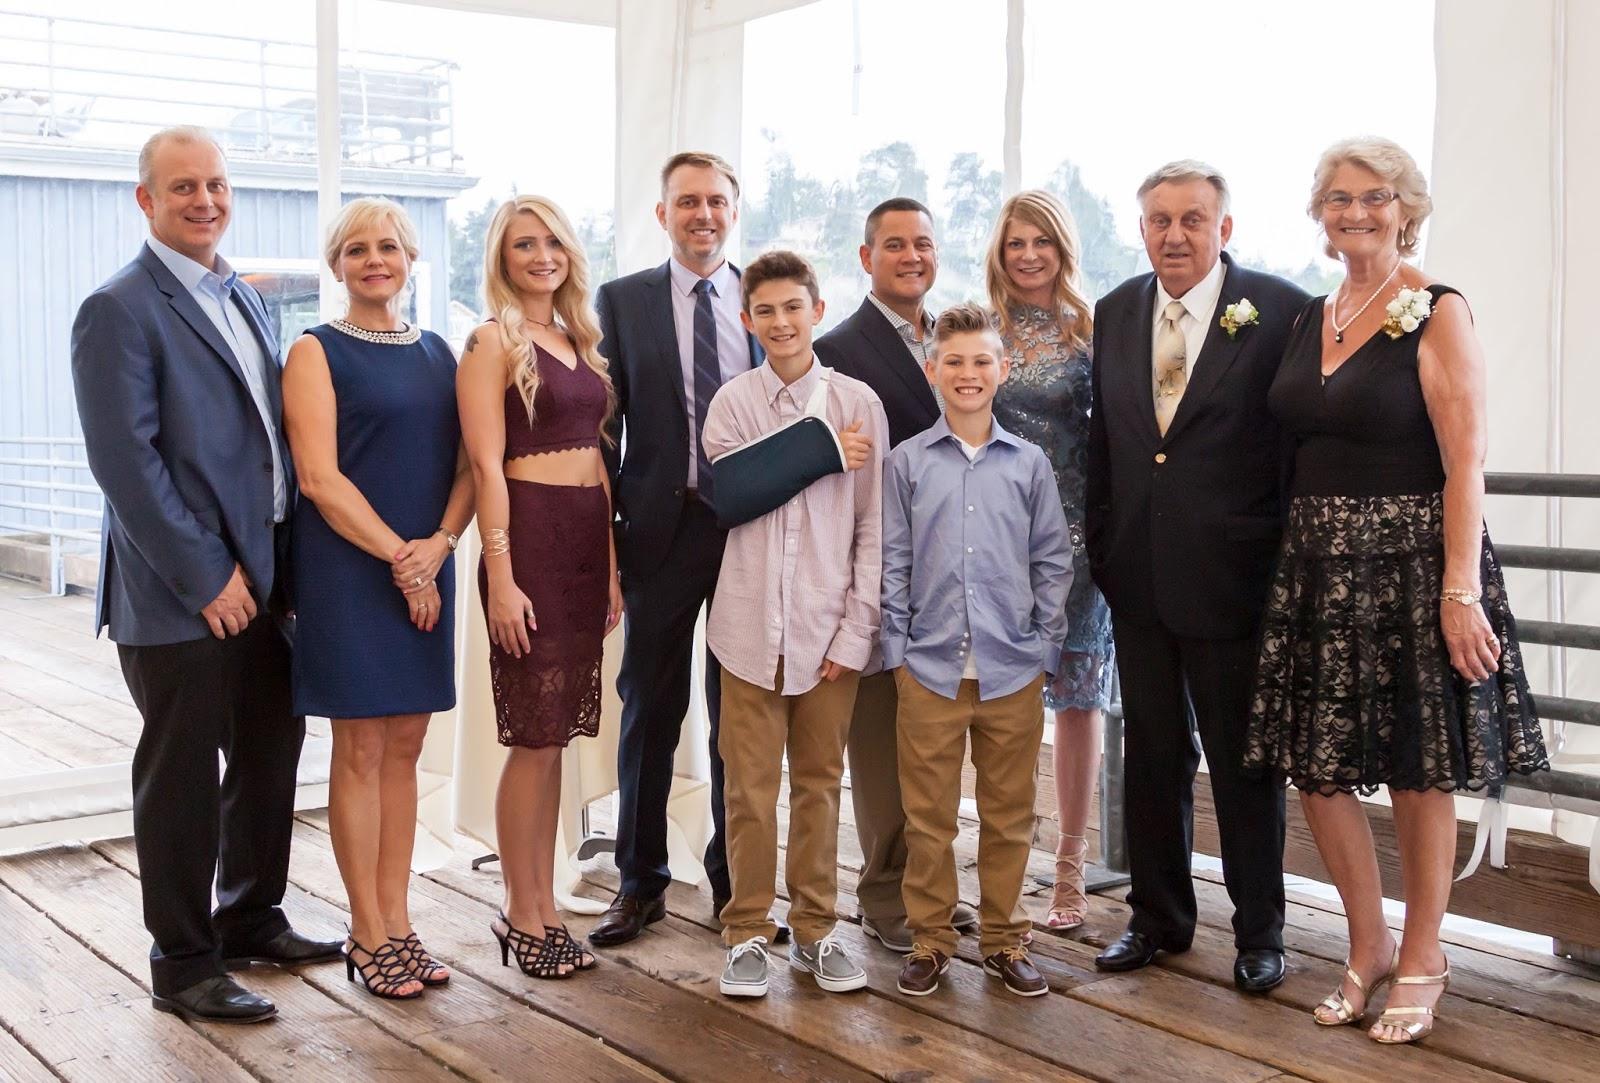 50 Years Of Marriage Else And Karl Johan Hansen Of Shoreline Shoreline Area News